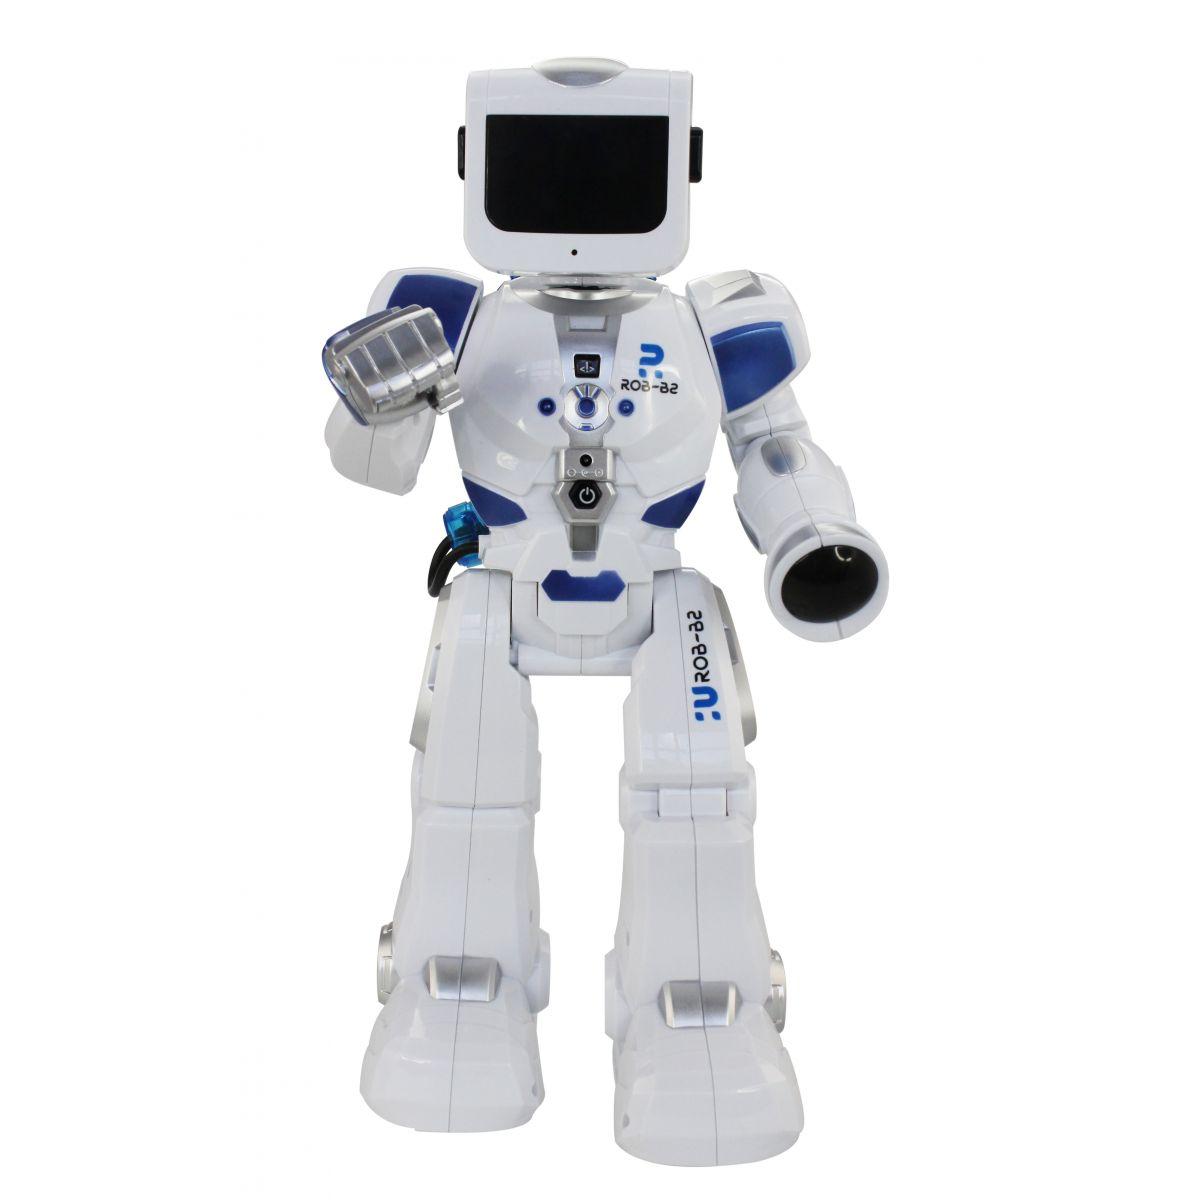 RCskladem EP Line Robot ROB-B2 PNP 23119987 bílomodrá 1:1